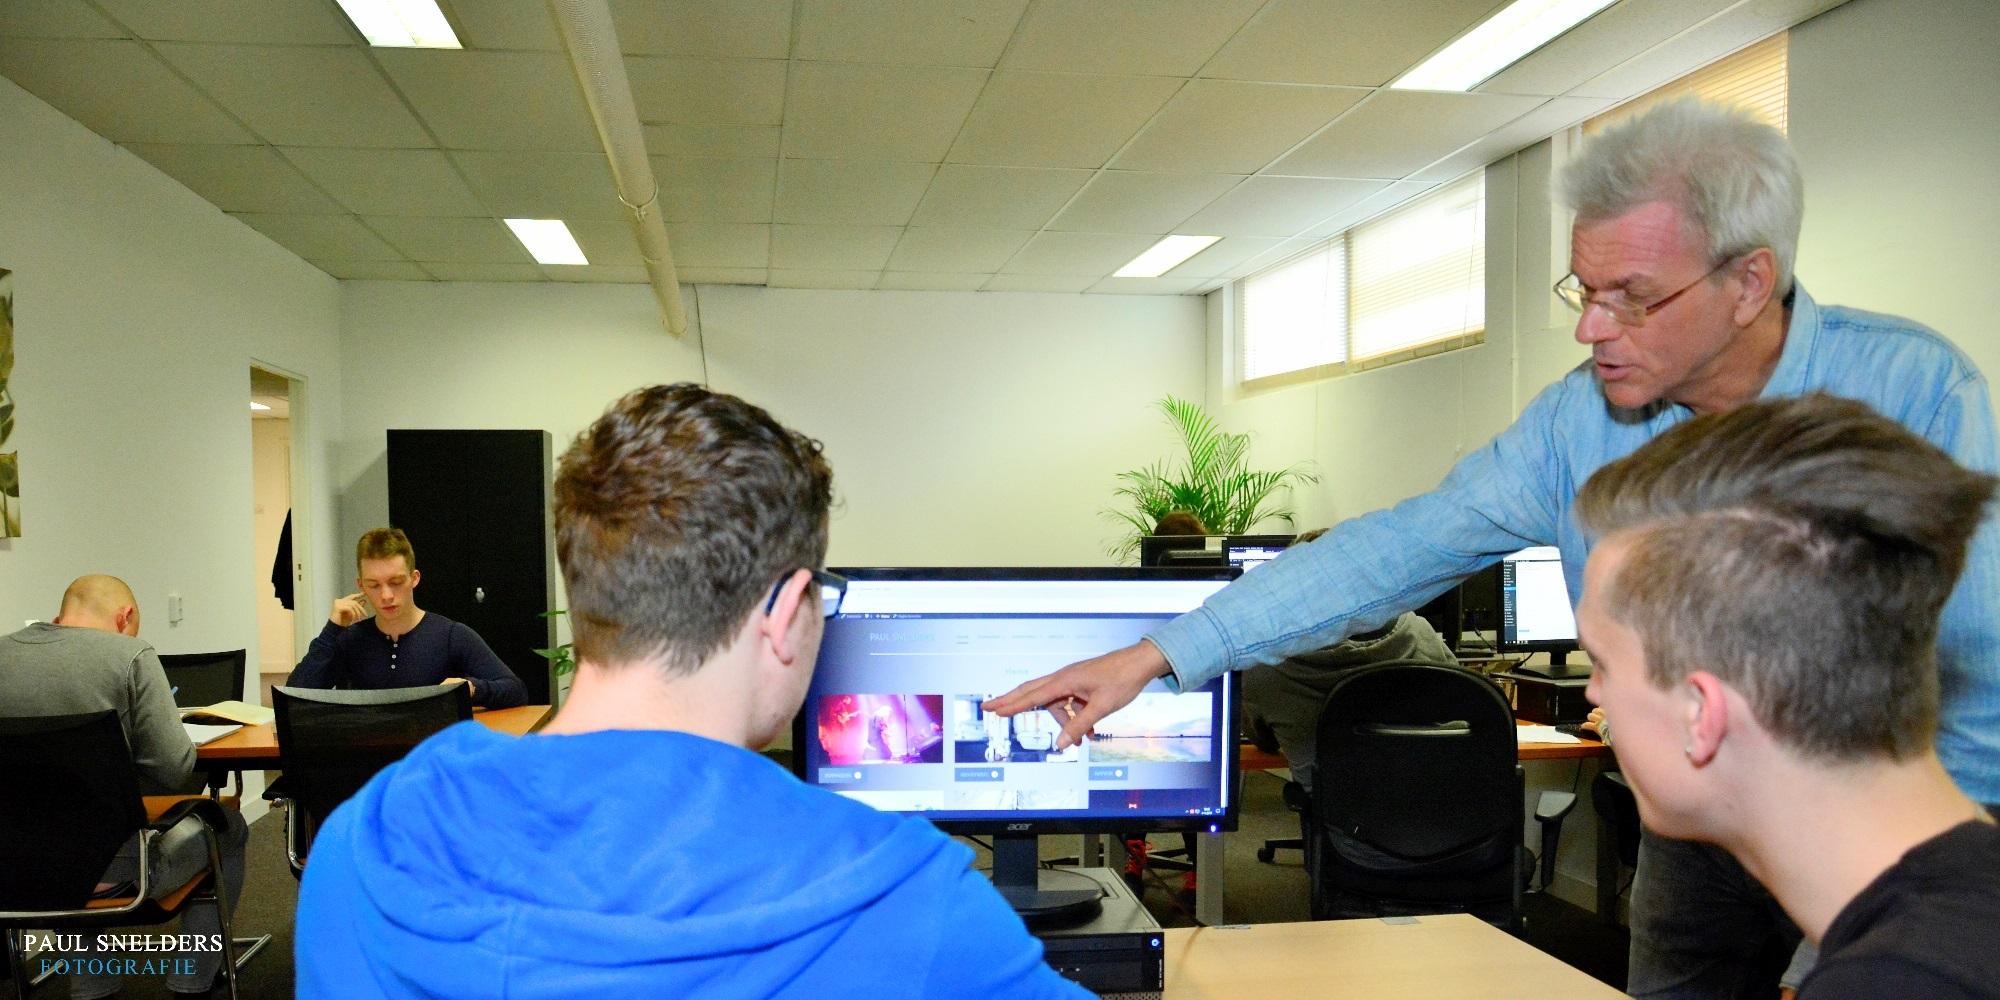 WerkRaat: Groep Webdesign - Leerwerkplekken Websites maken